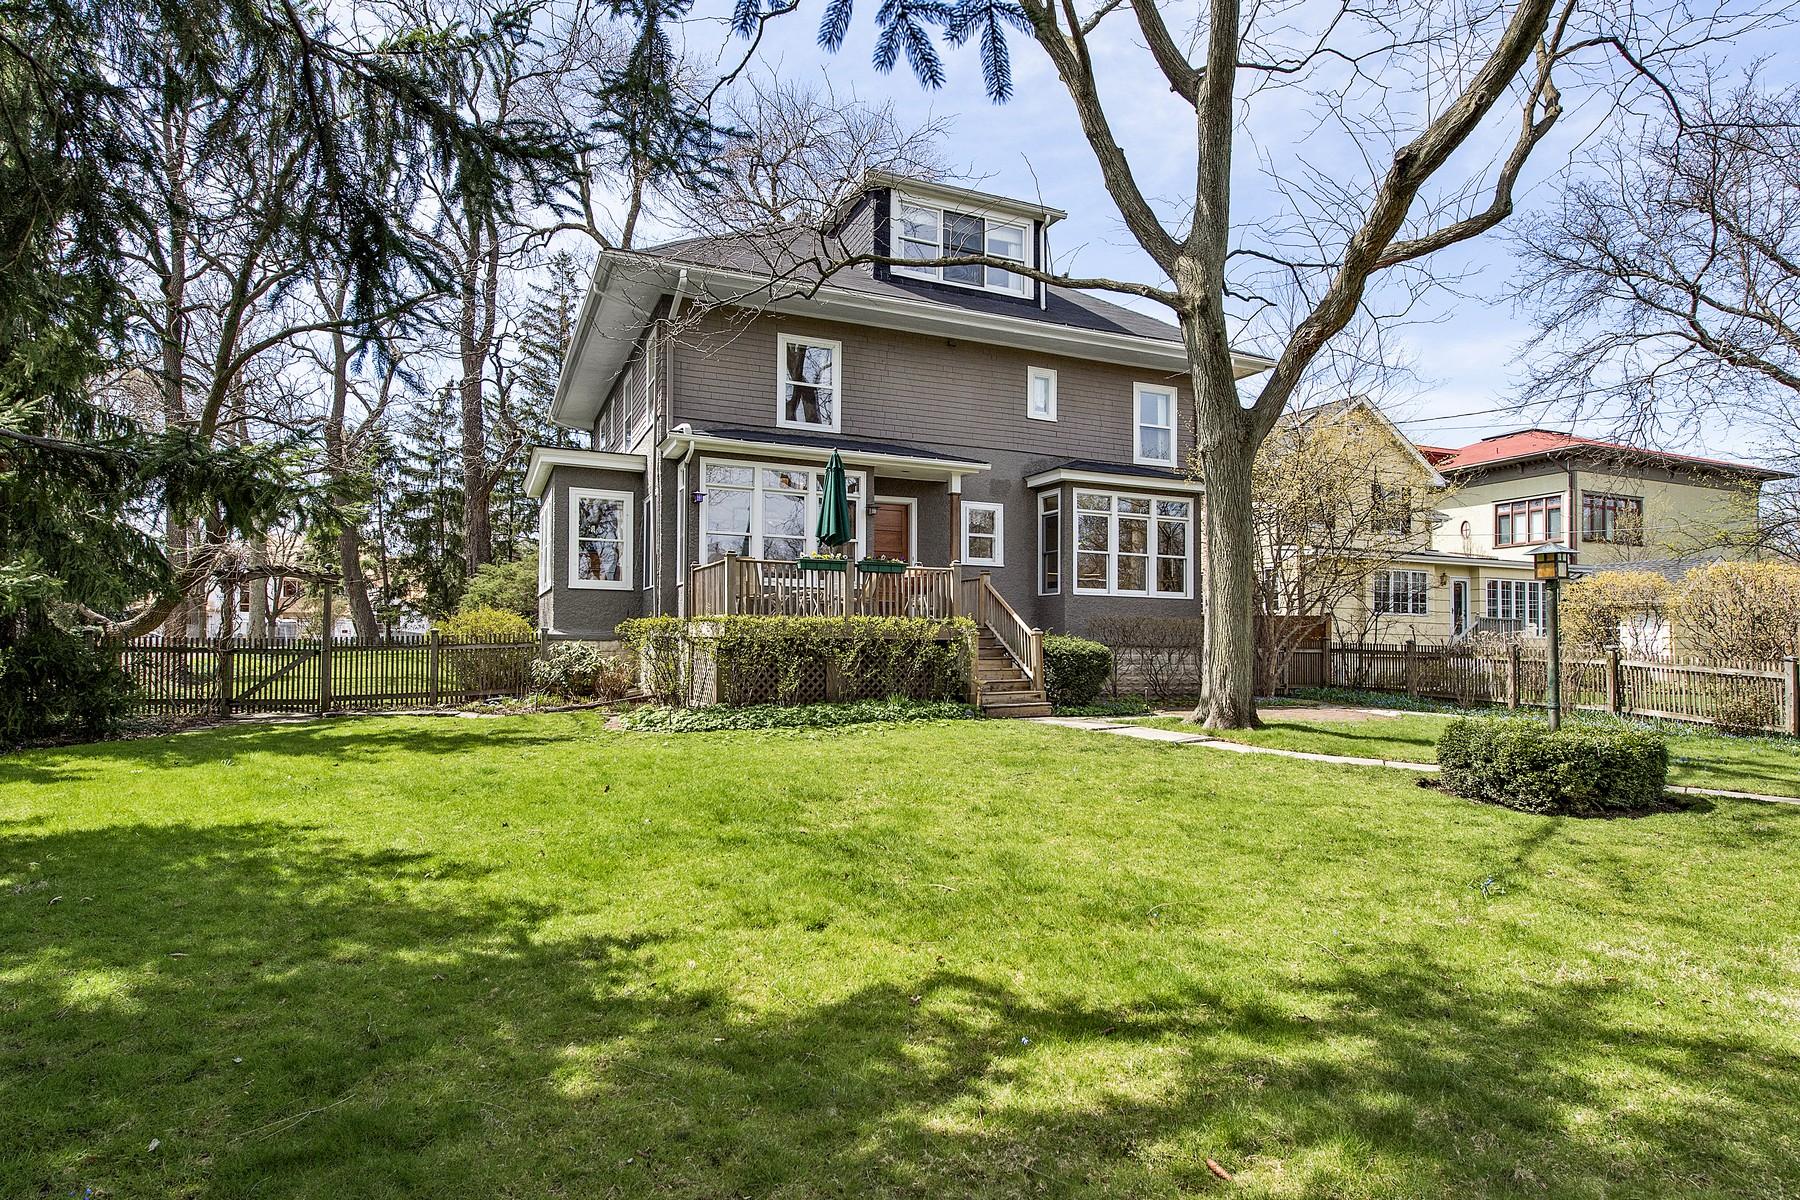 Villa per Vendita alle ore 123 N Washington Hinsdale, Illinois, 60521 Stati Uniti